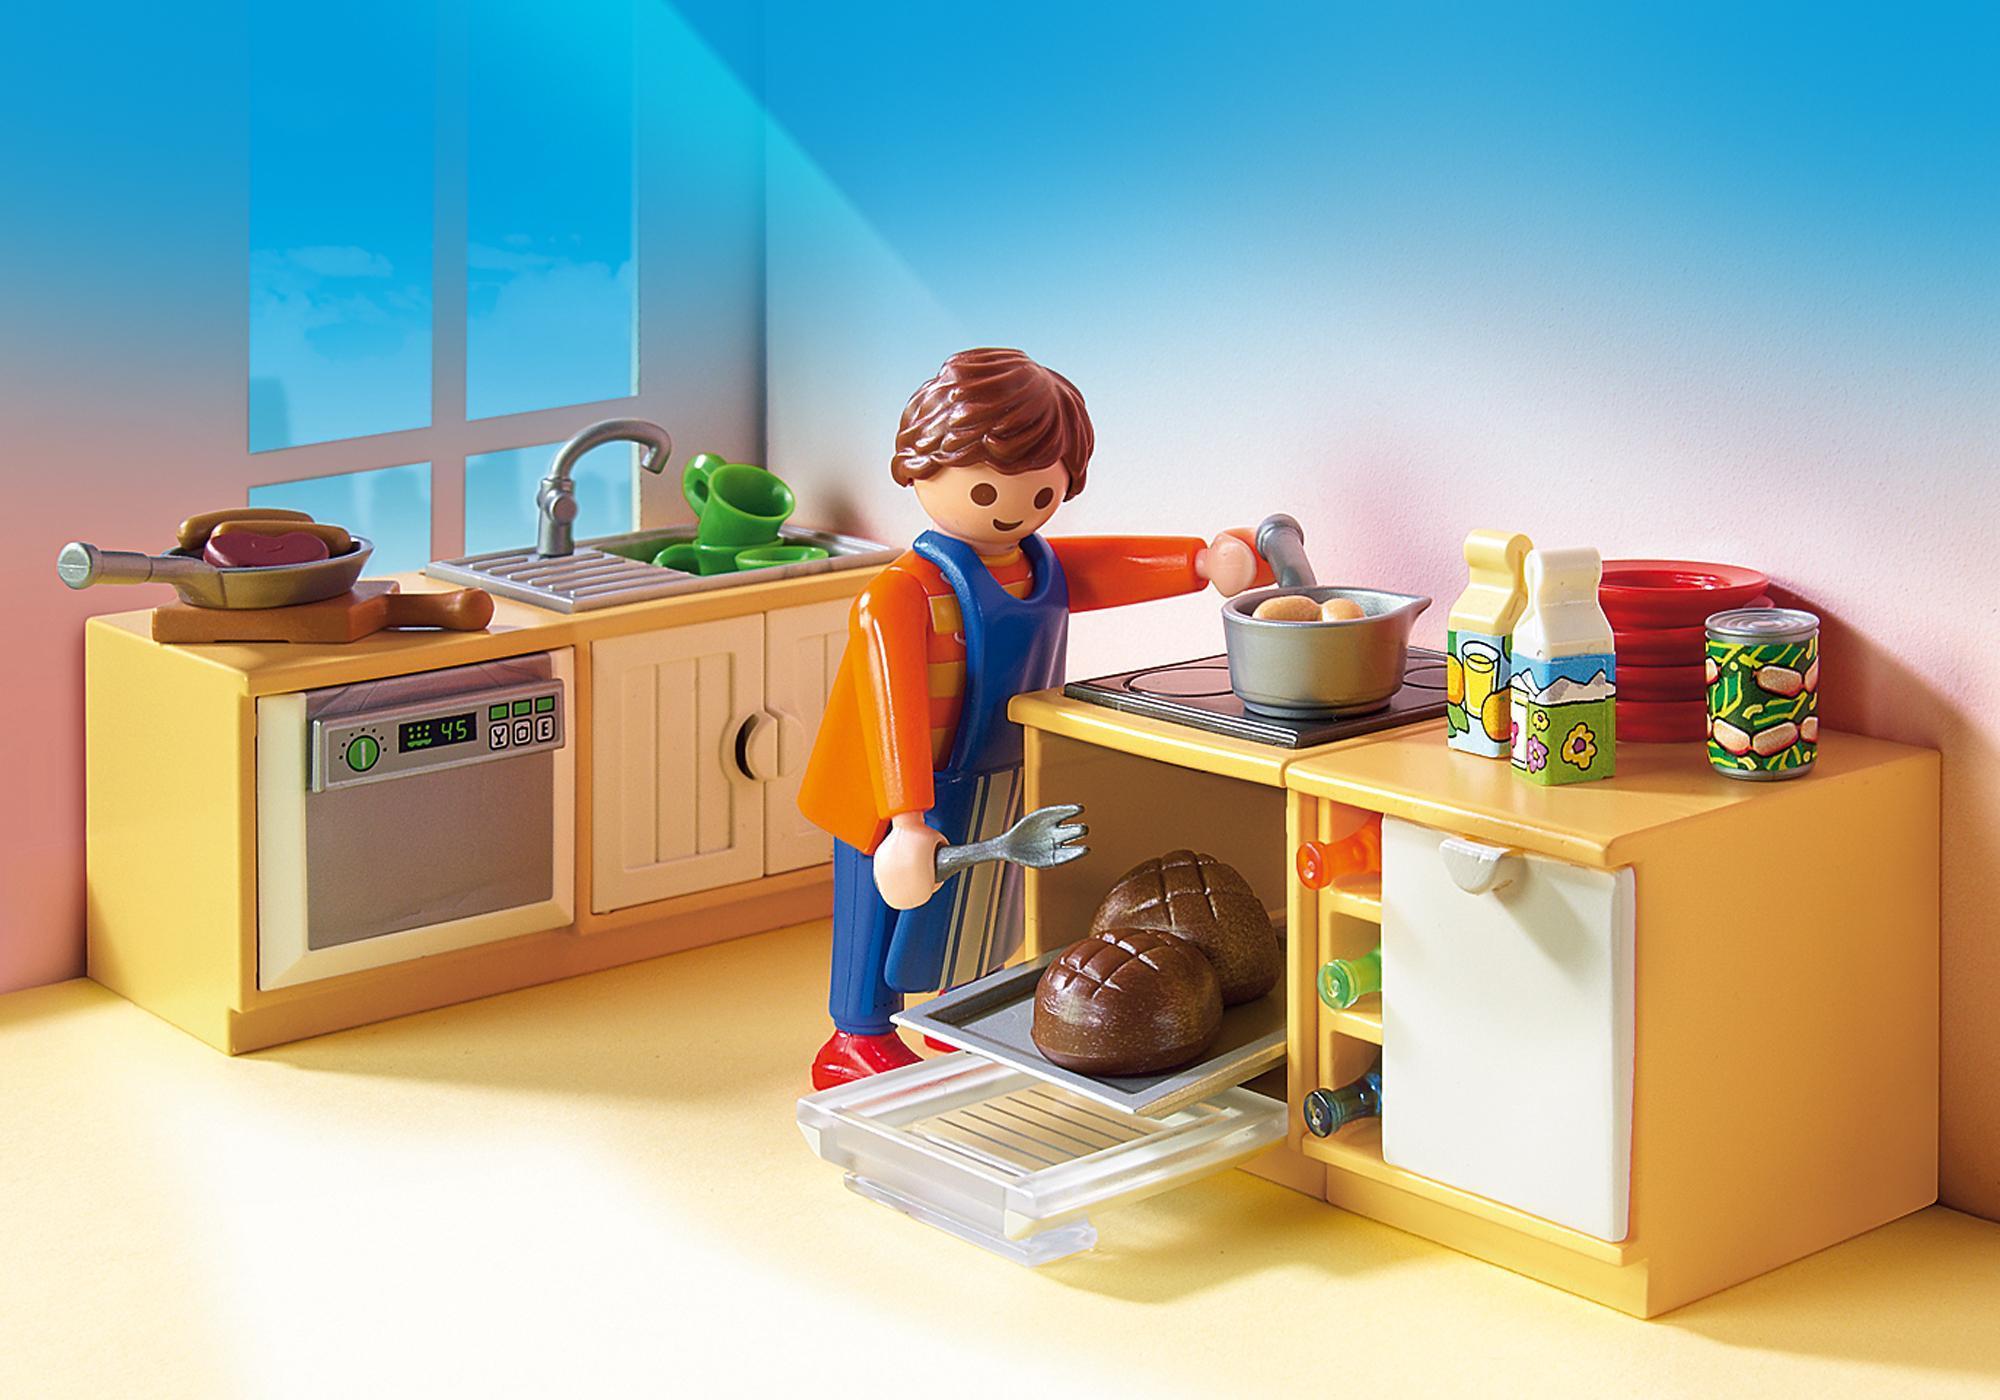 http://media.playmobil.com/i/playmobil/5336_product_extra2/Einbauküche mit Sitzecke